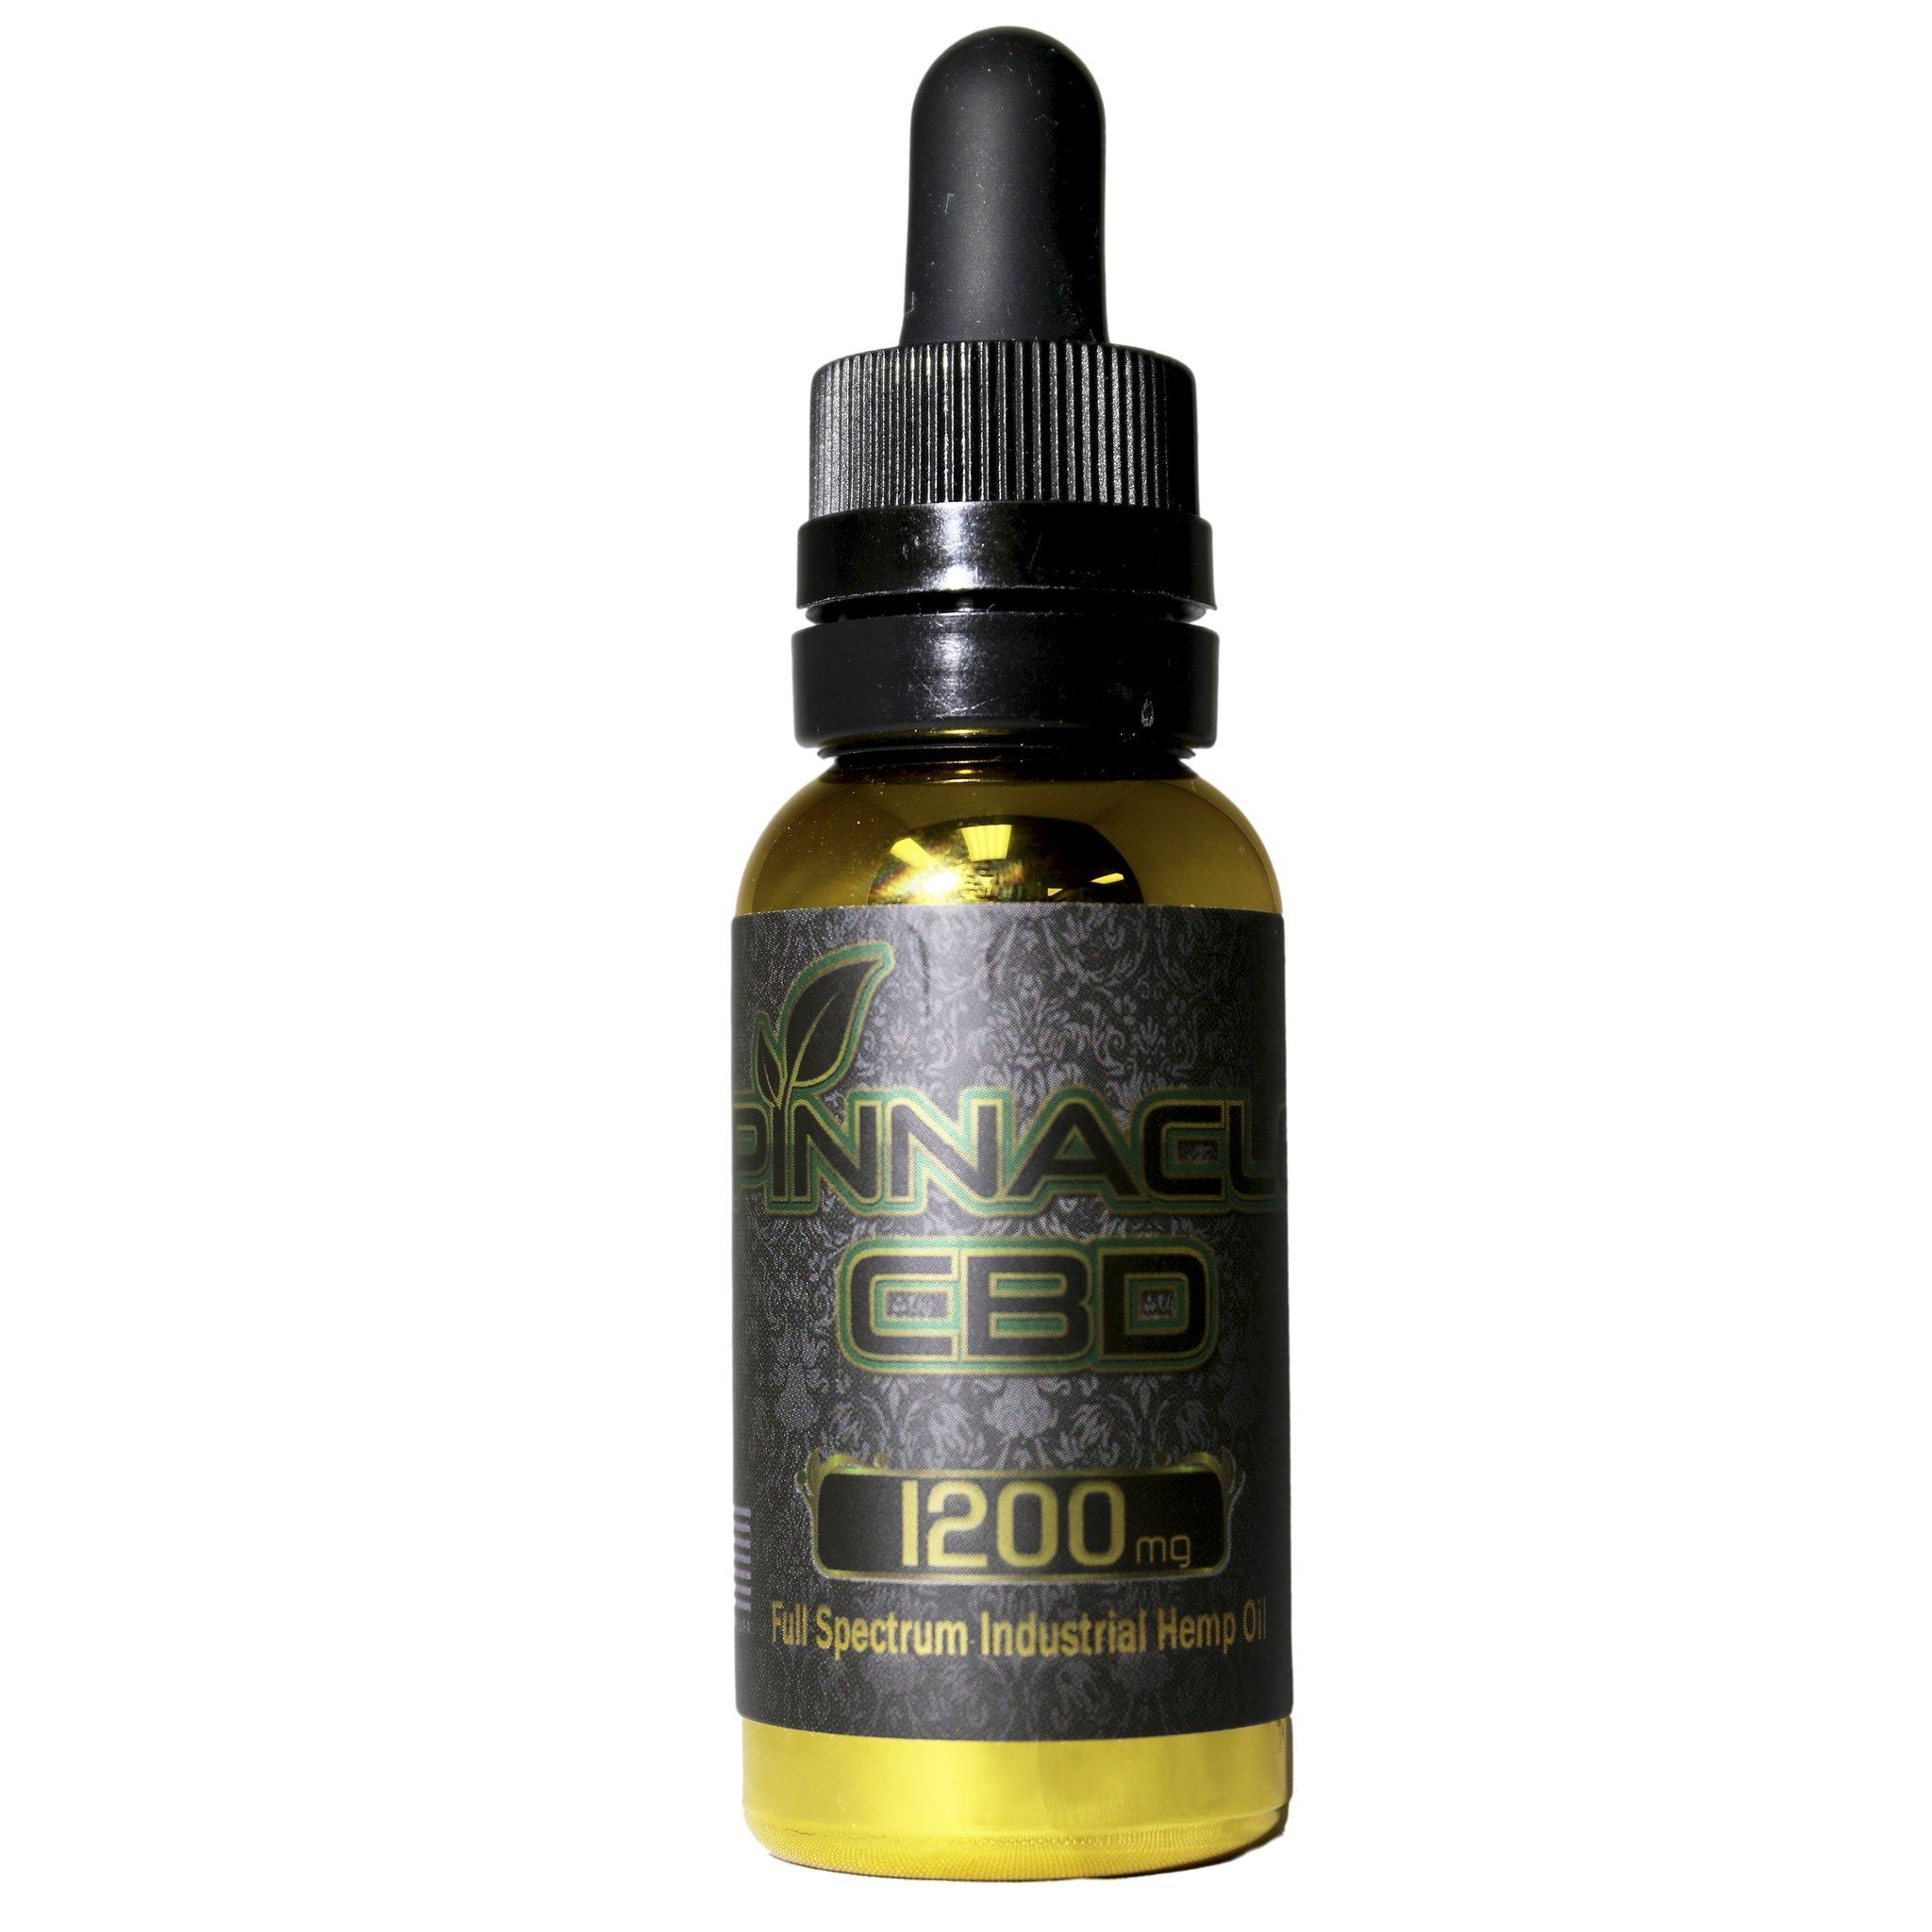 Pinnacle Vapor CBD Oil 1200 mg Bottle